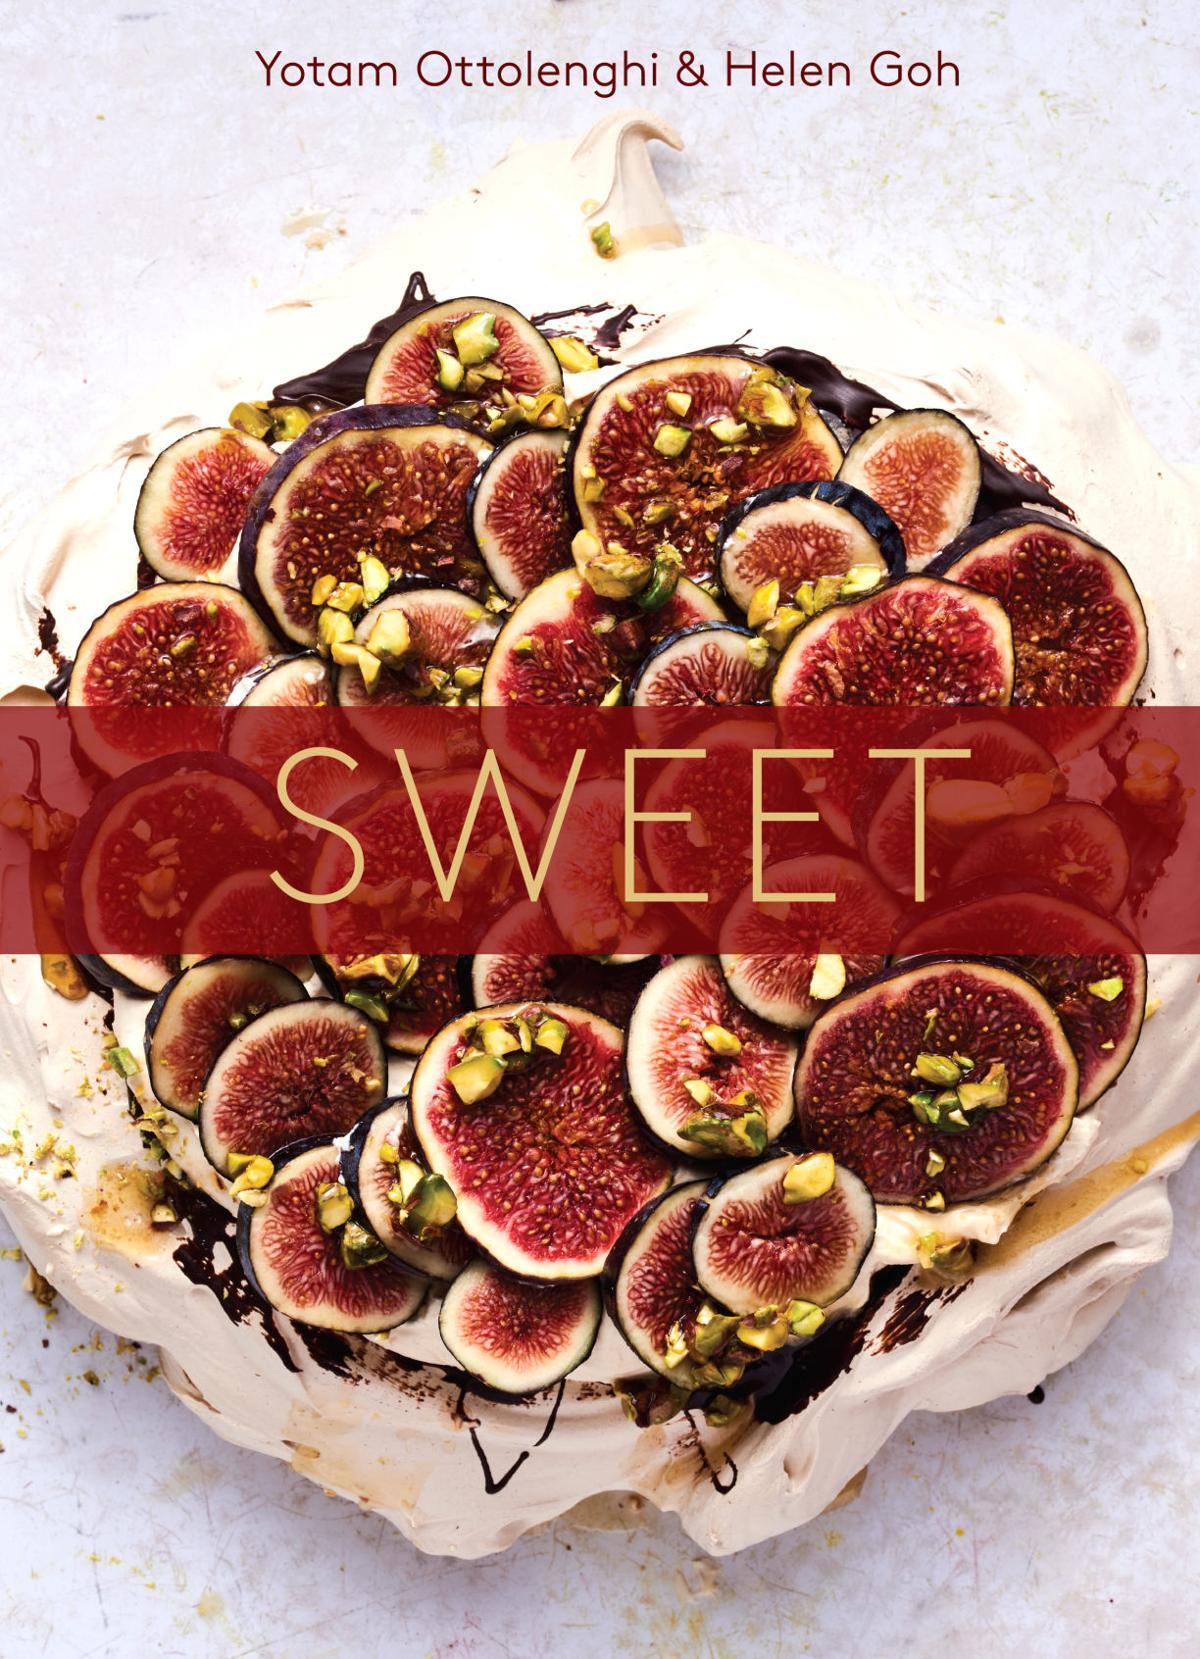 Sweet cookbook